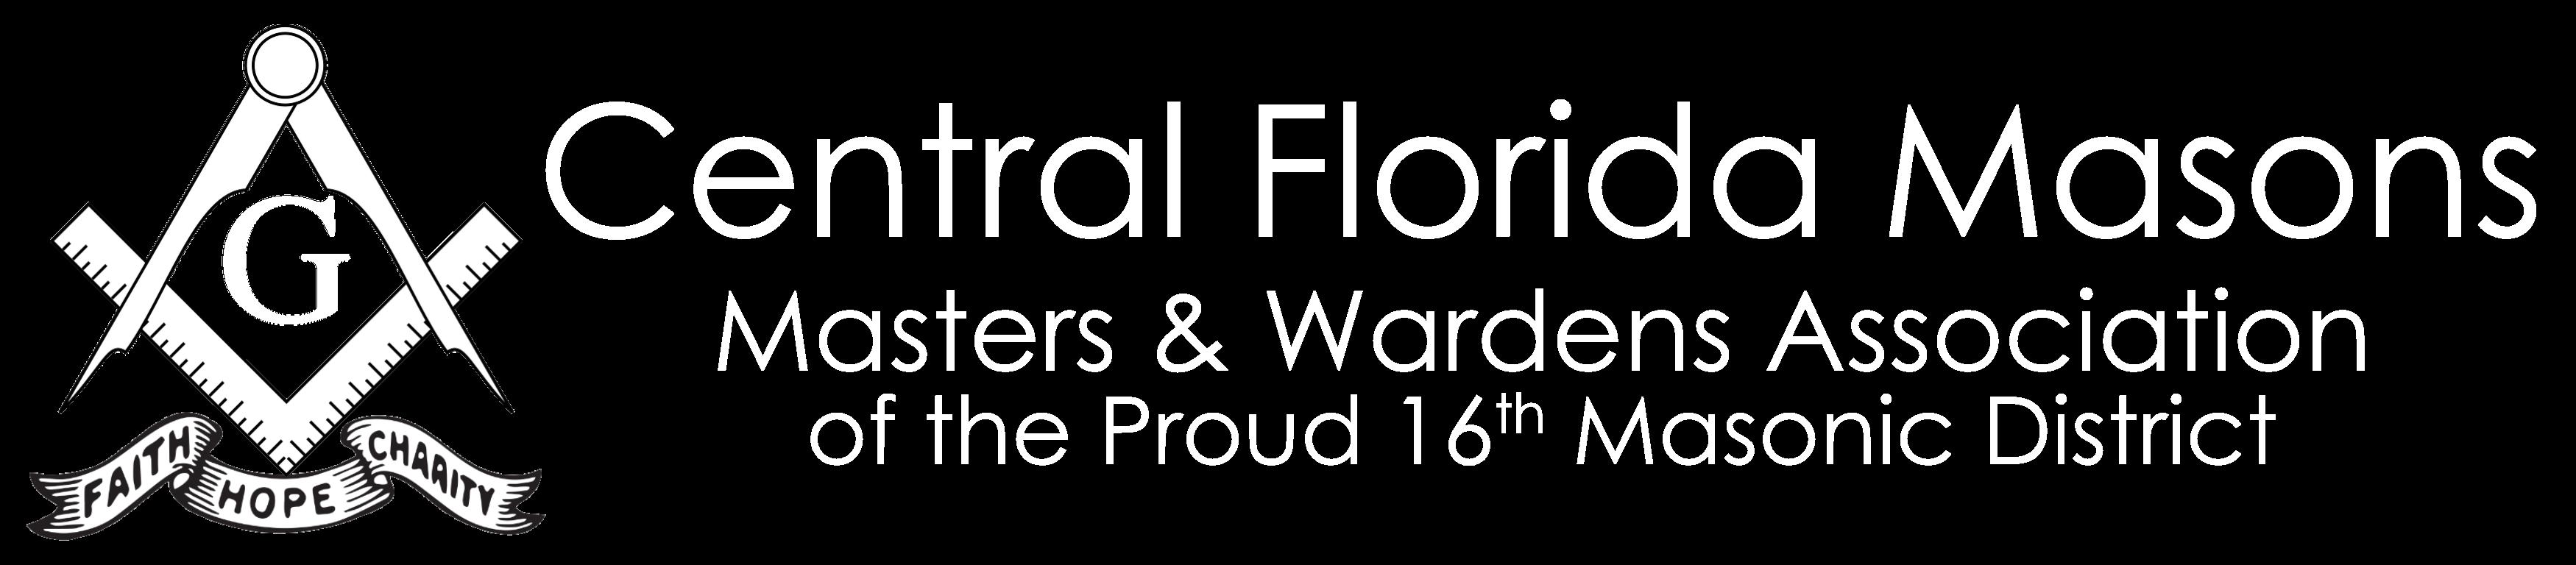 Central Florida Masons